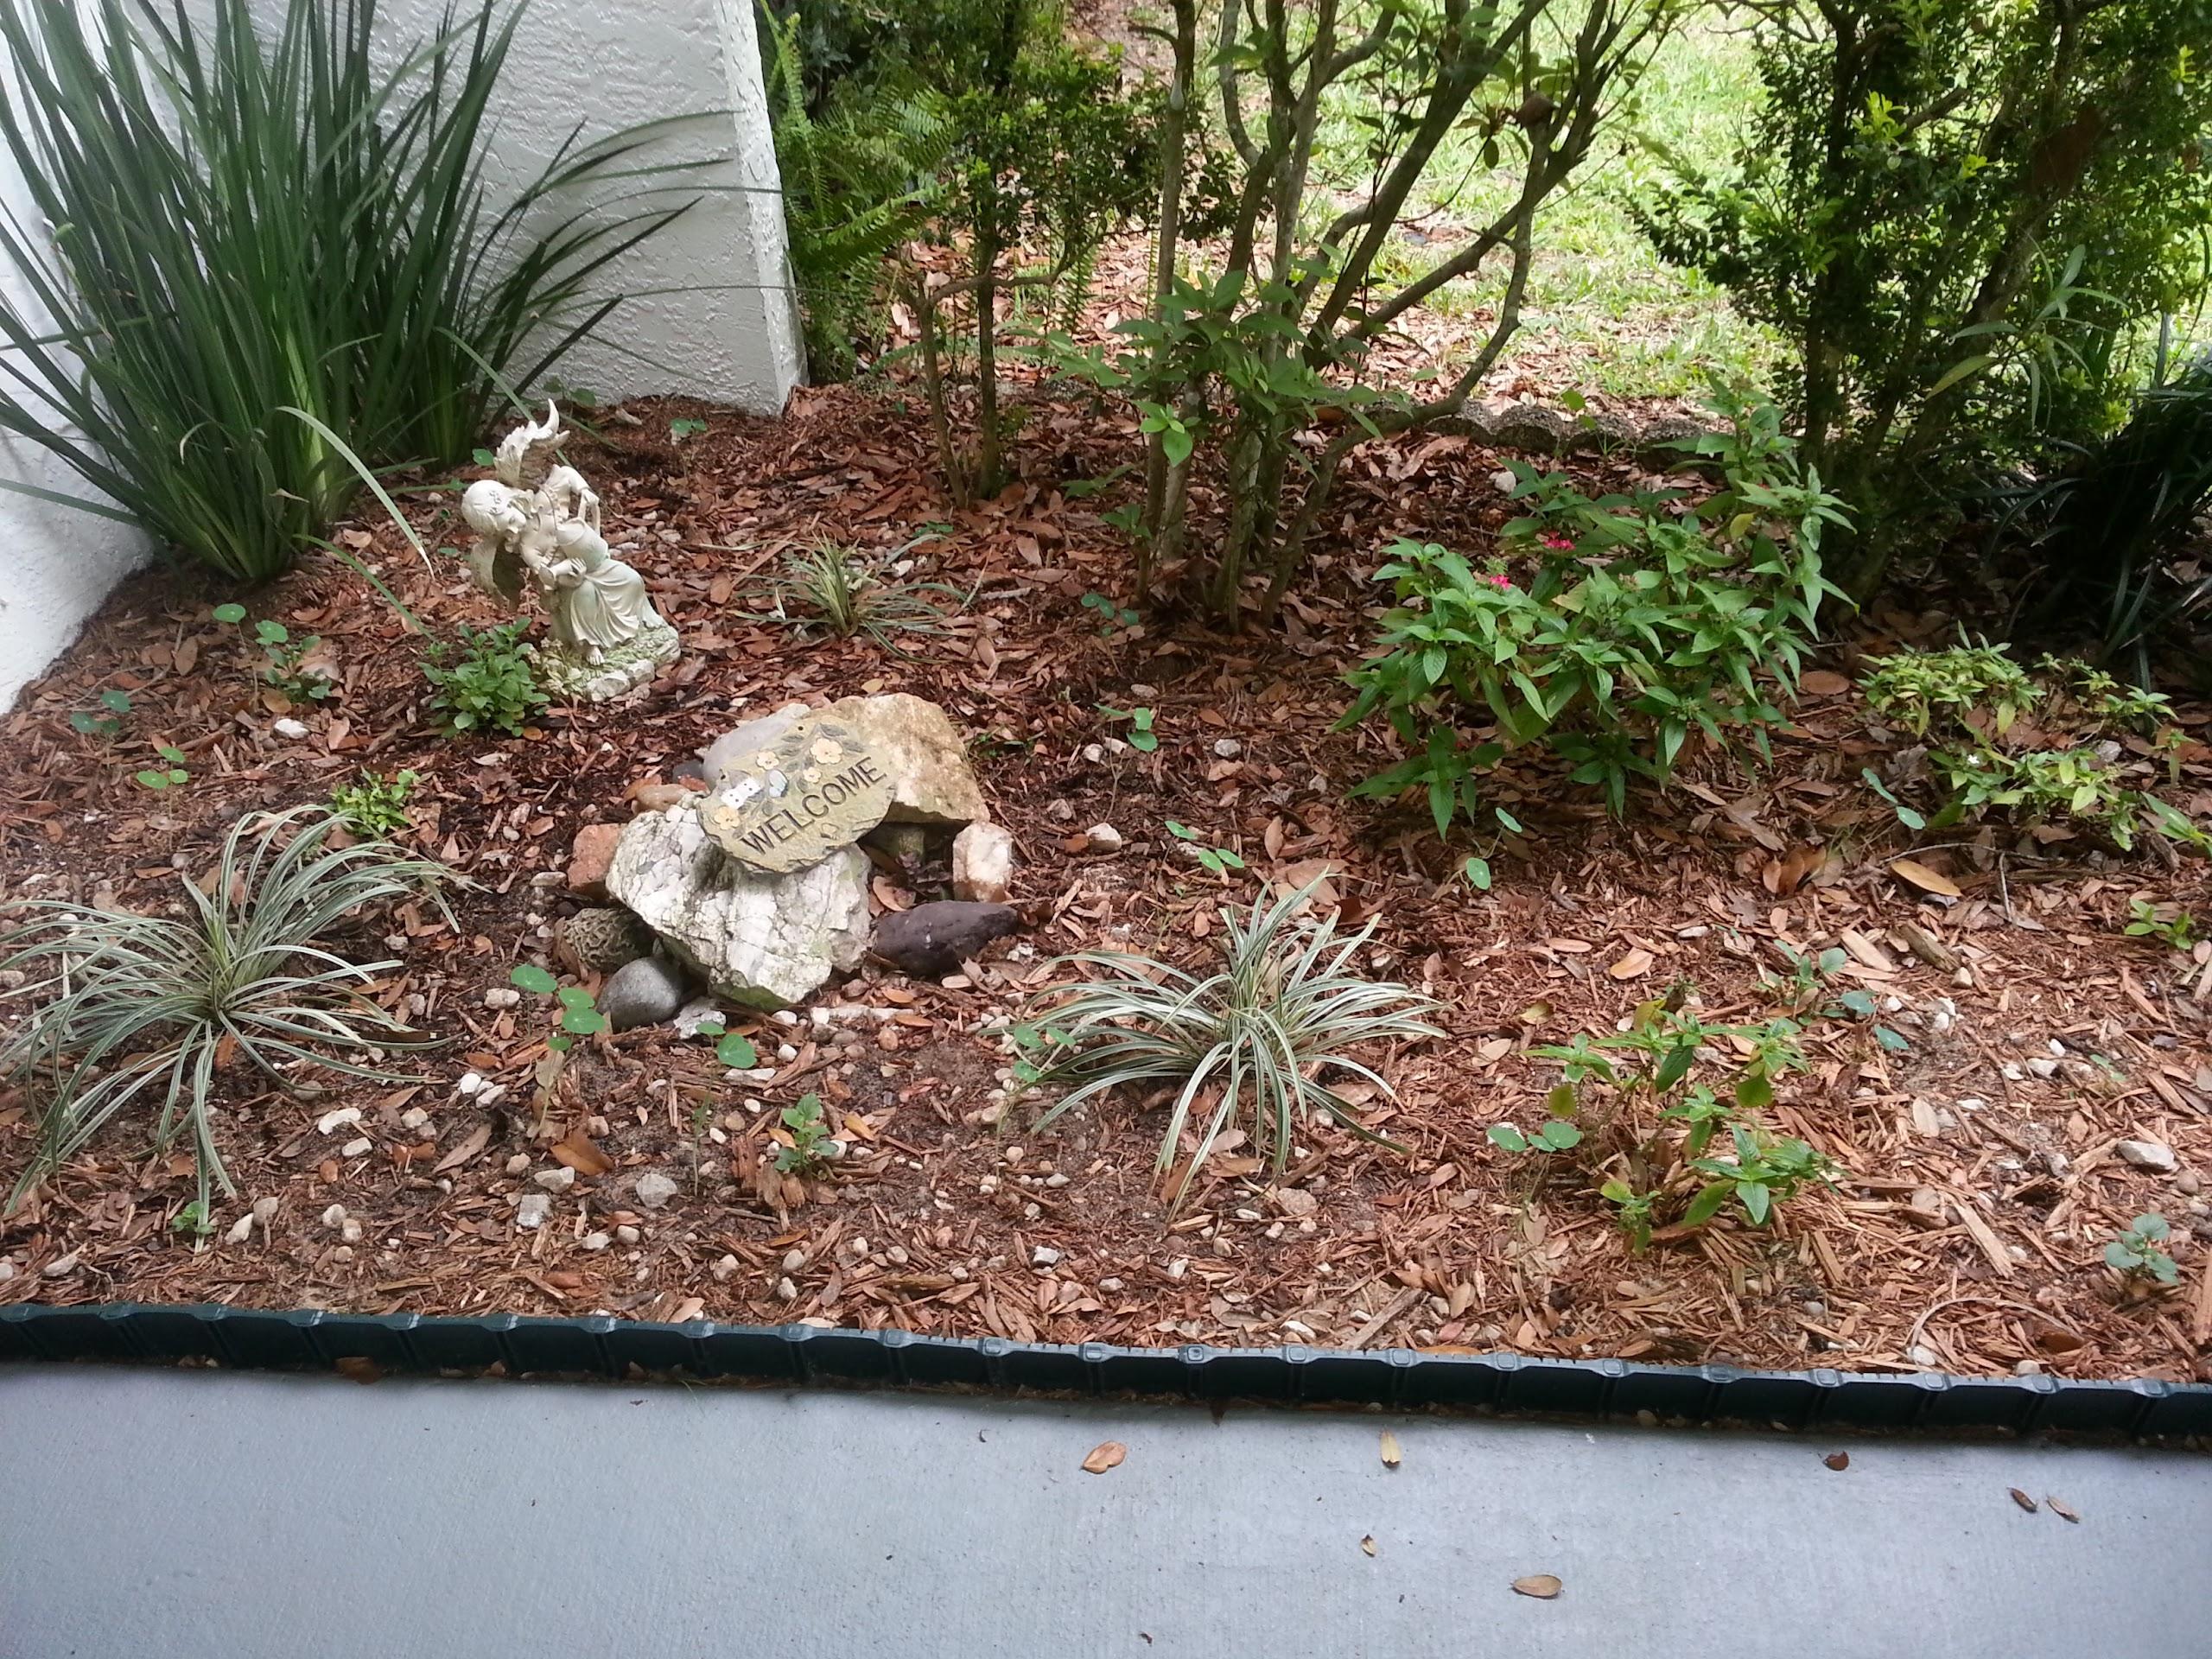 My garden and Aerogardens: Garden News, 2nd edition